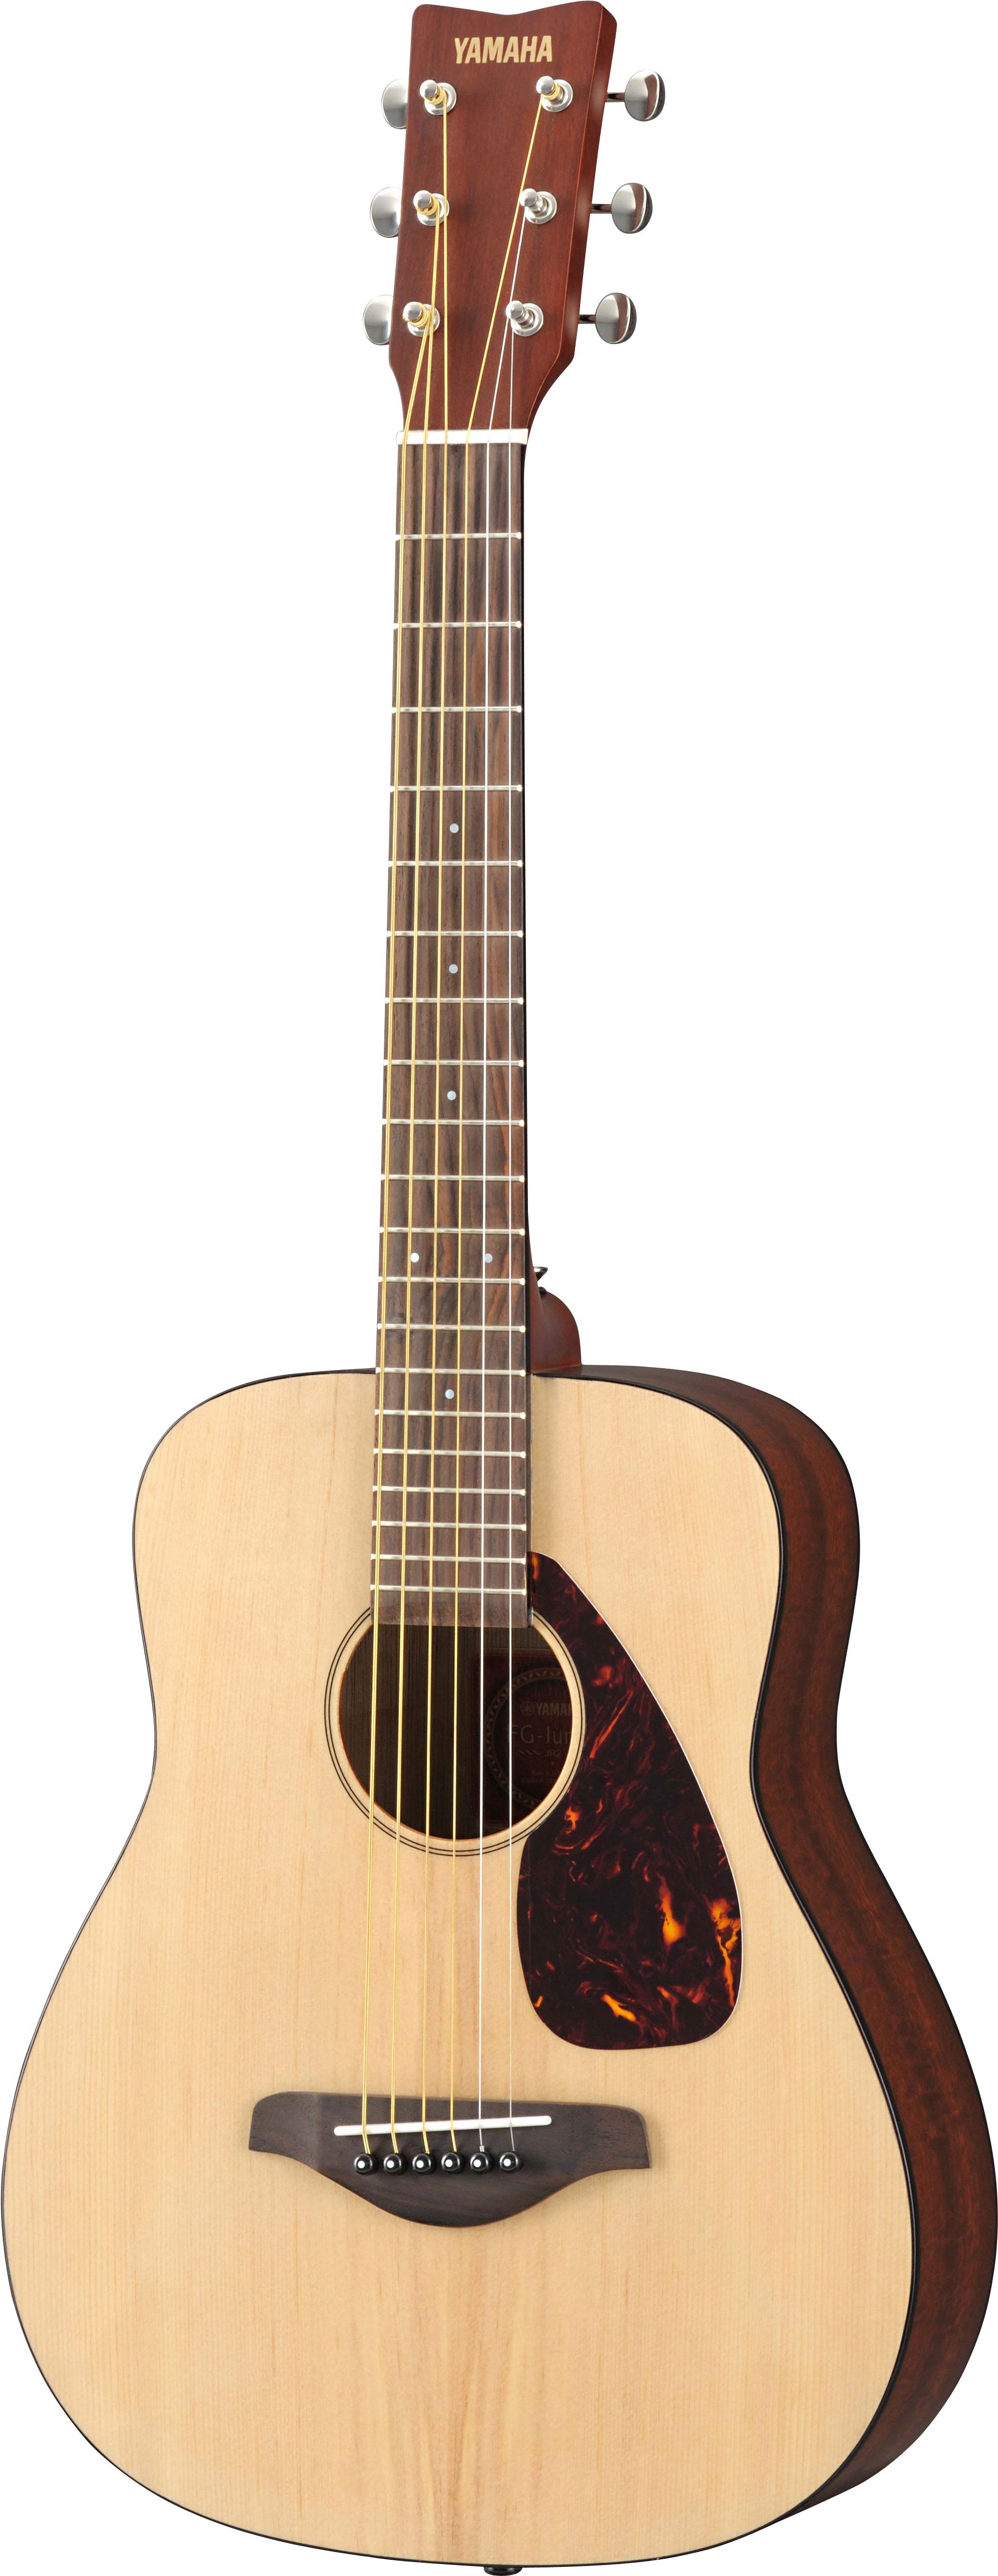 Yamaha jr2 3 4 size acoustic guitar natural w gig bag for Yamaha acoustic guitar ebay